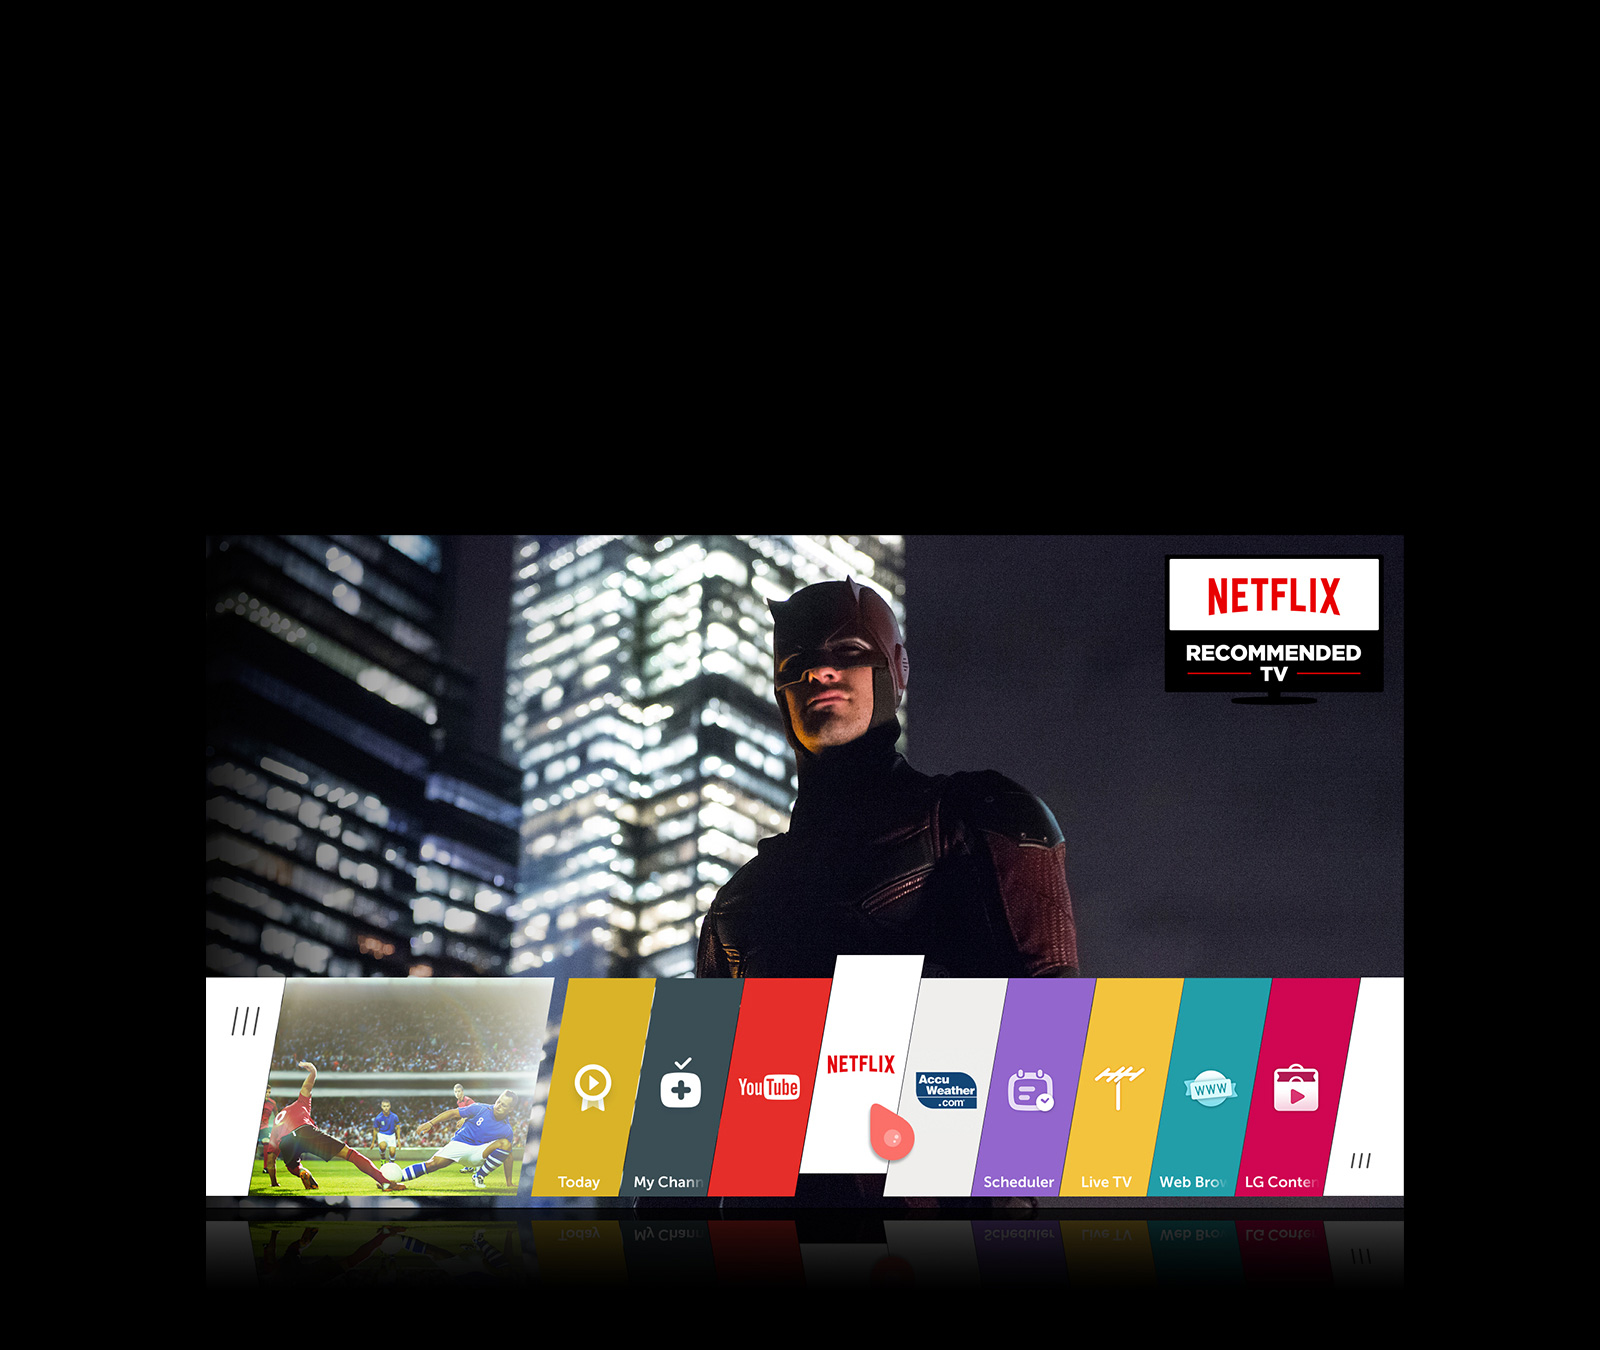 LG 55 inch 4K LED Smart TV - 55UF7600 | Dell United States